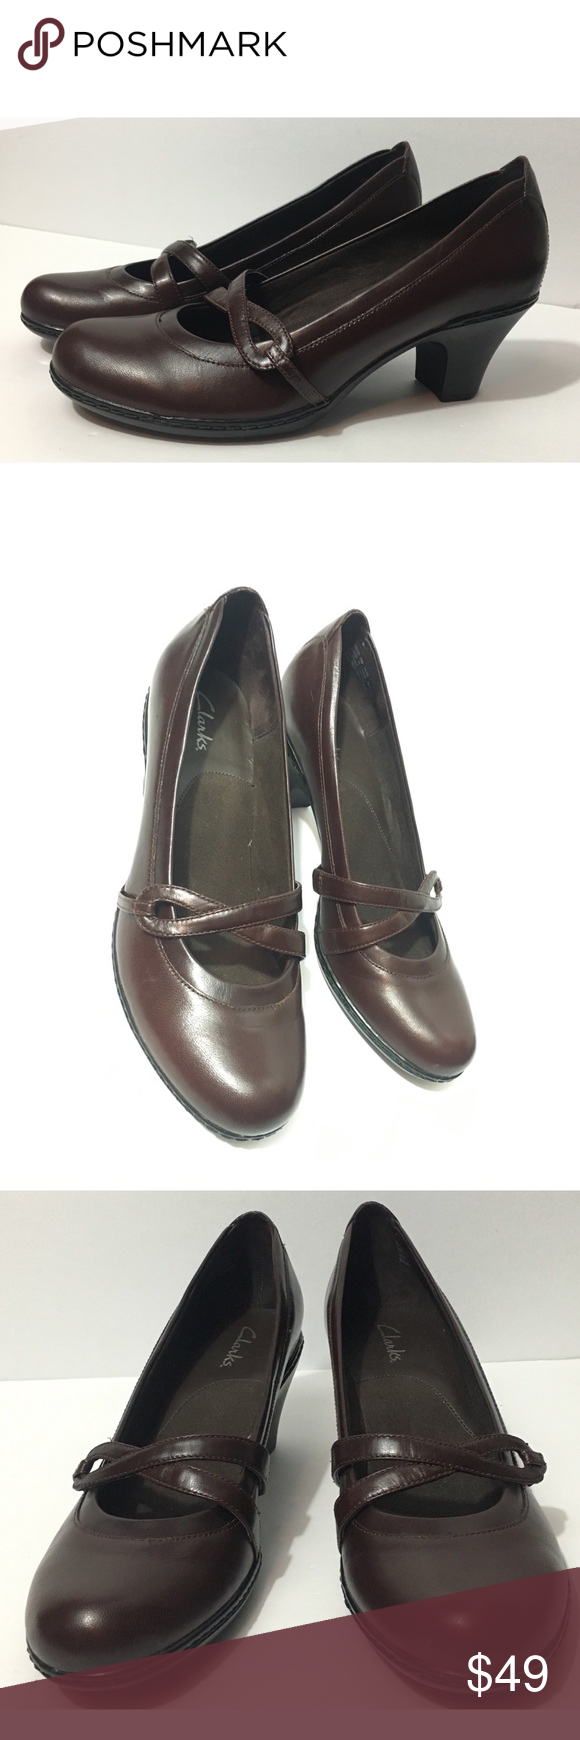 "Womens CLARKS Bendables Brown Leather 2"" Heel Pumps Slip-on Shoes 8M - EUC"